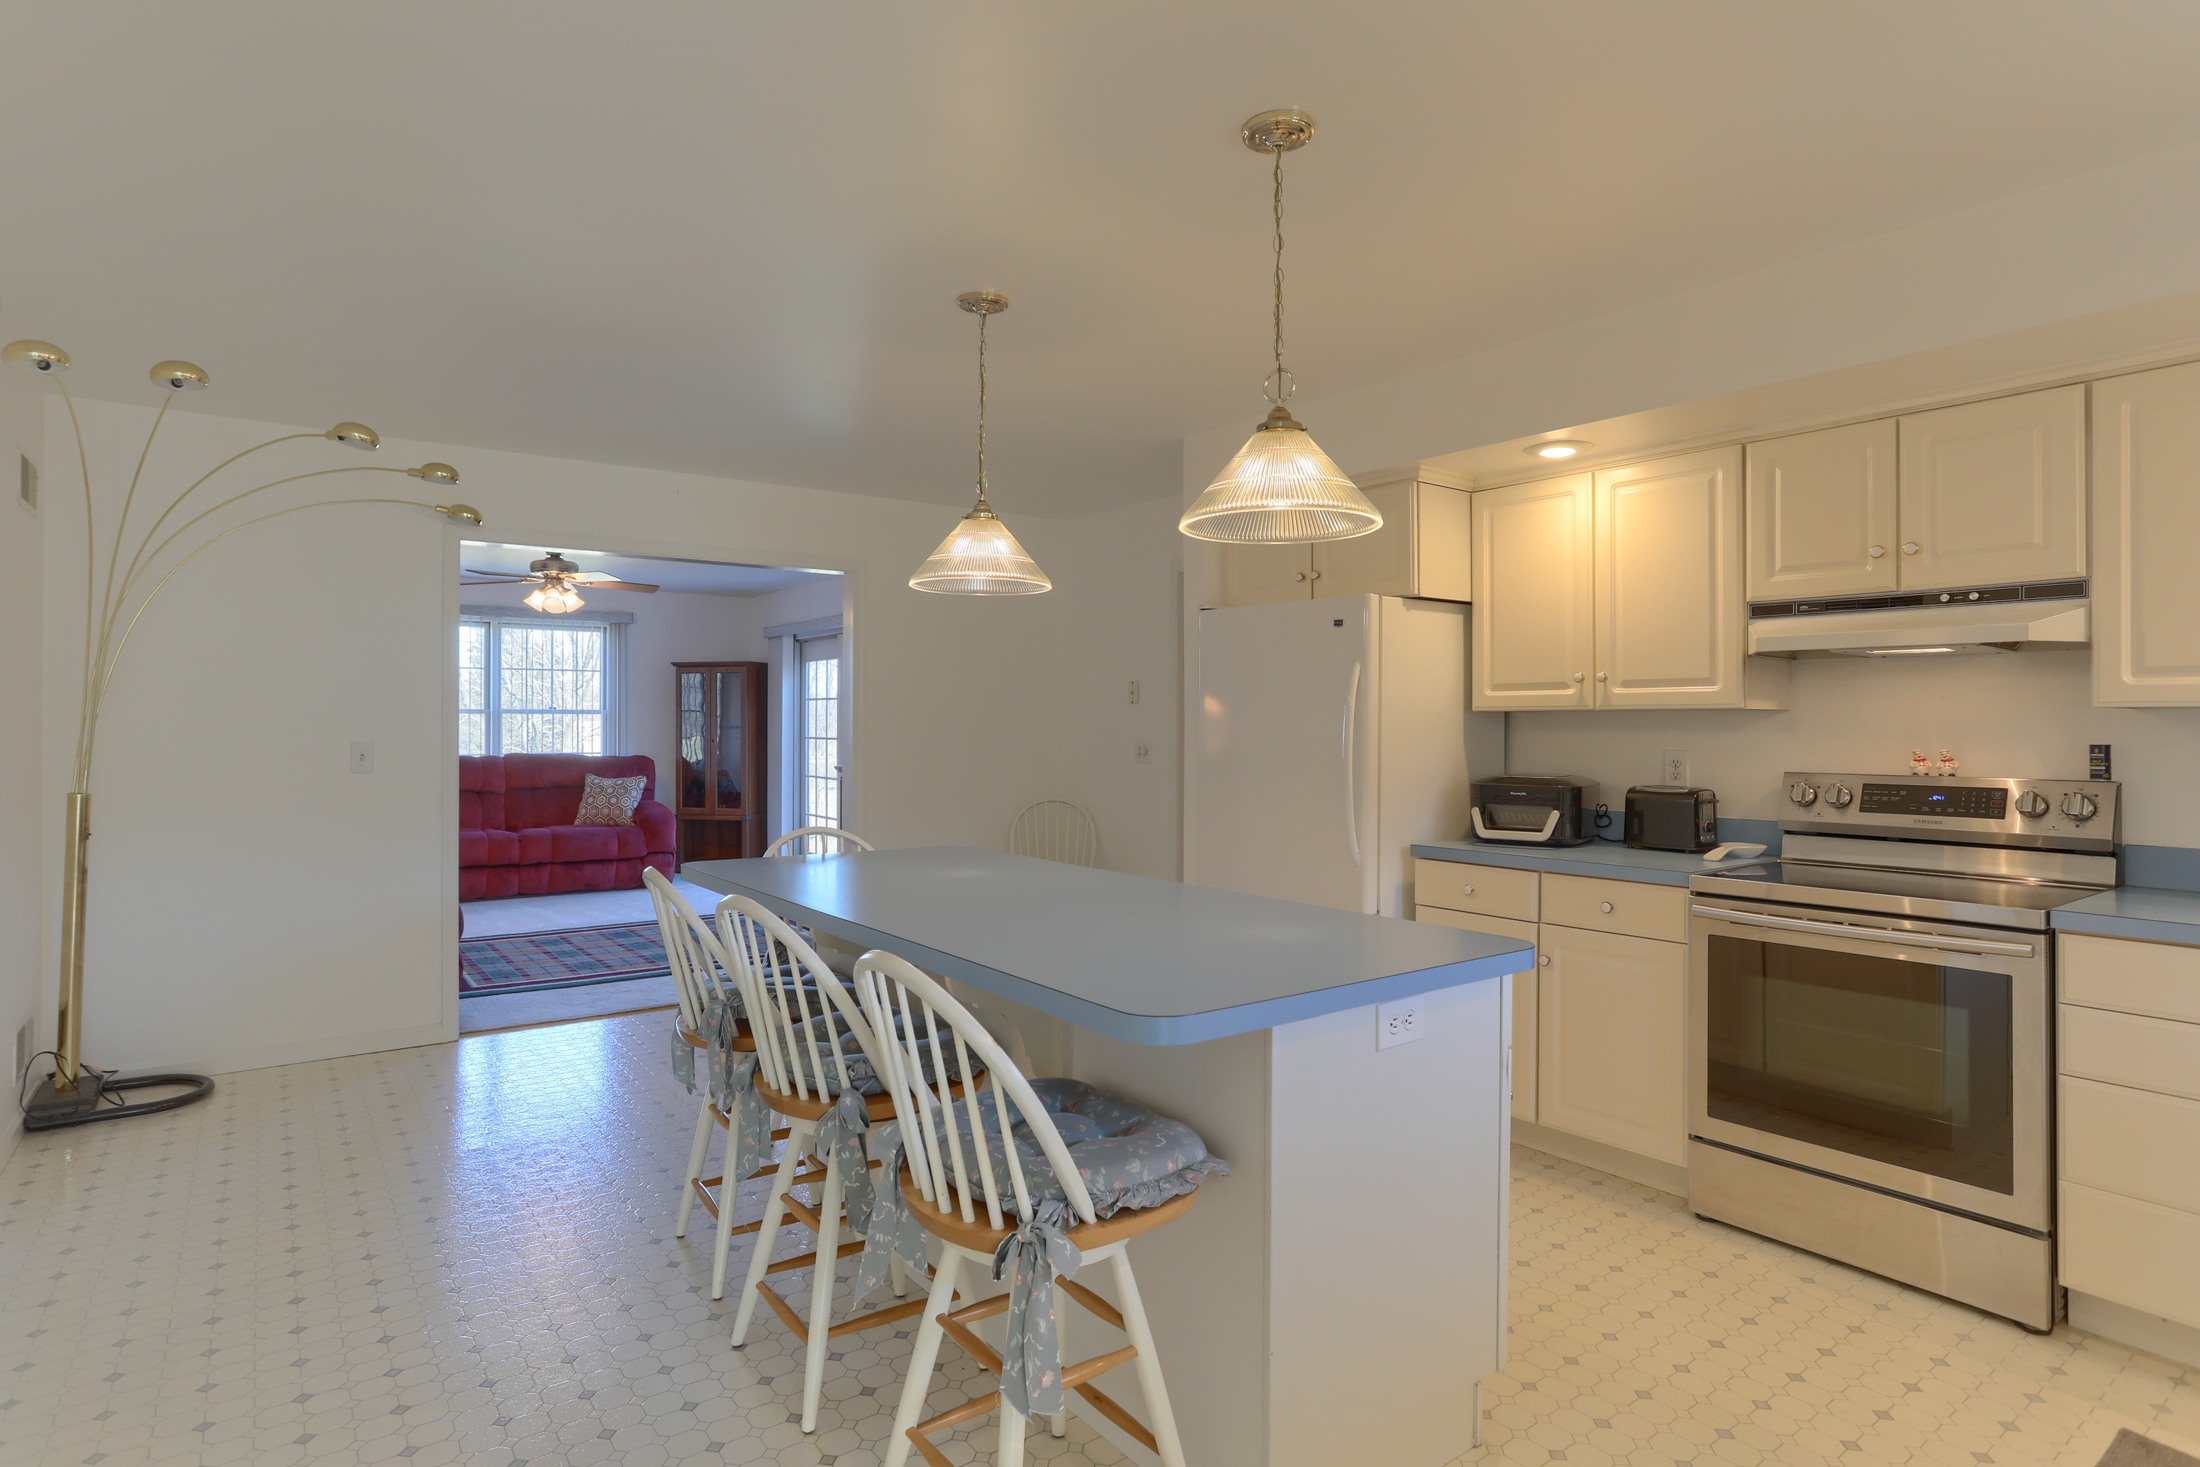 26 W. Strack Drive - Large Kitchen 2